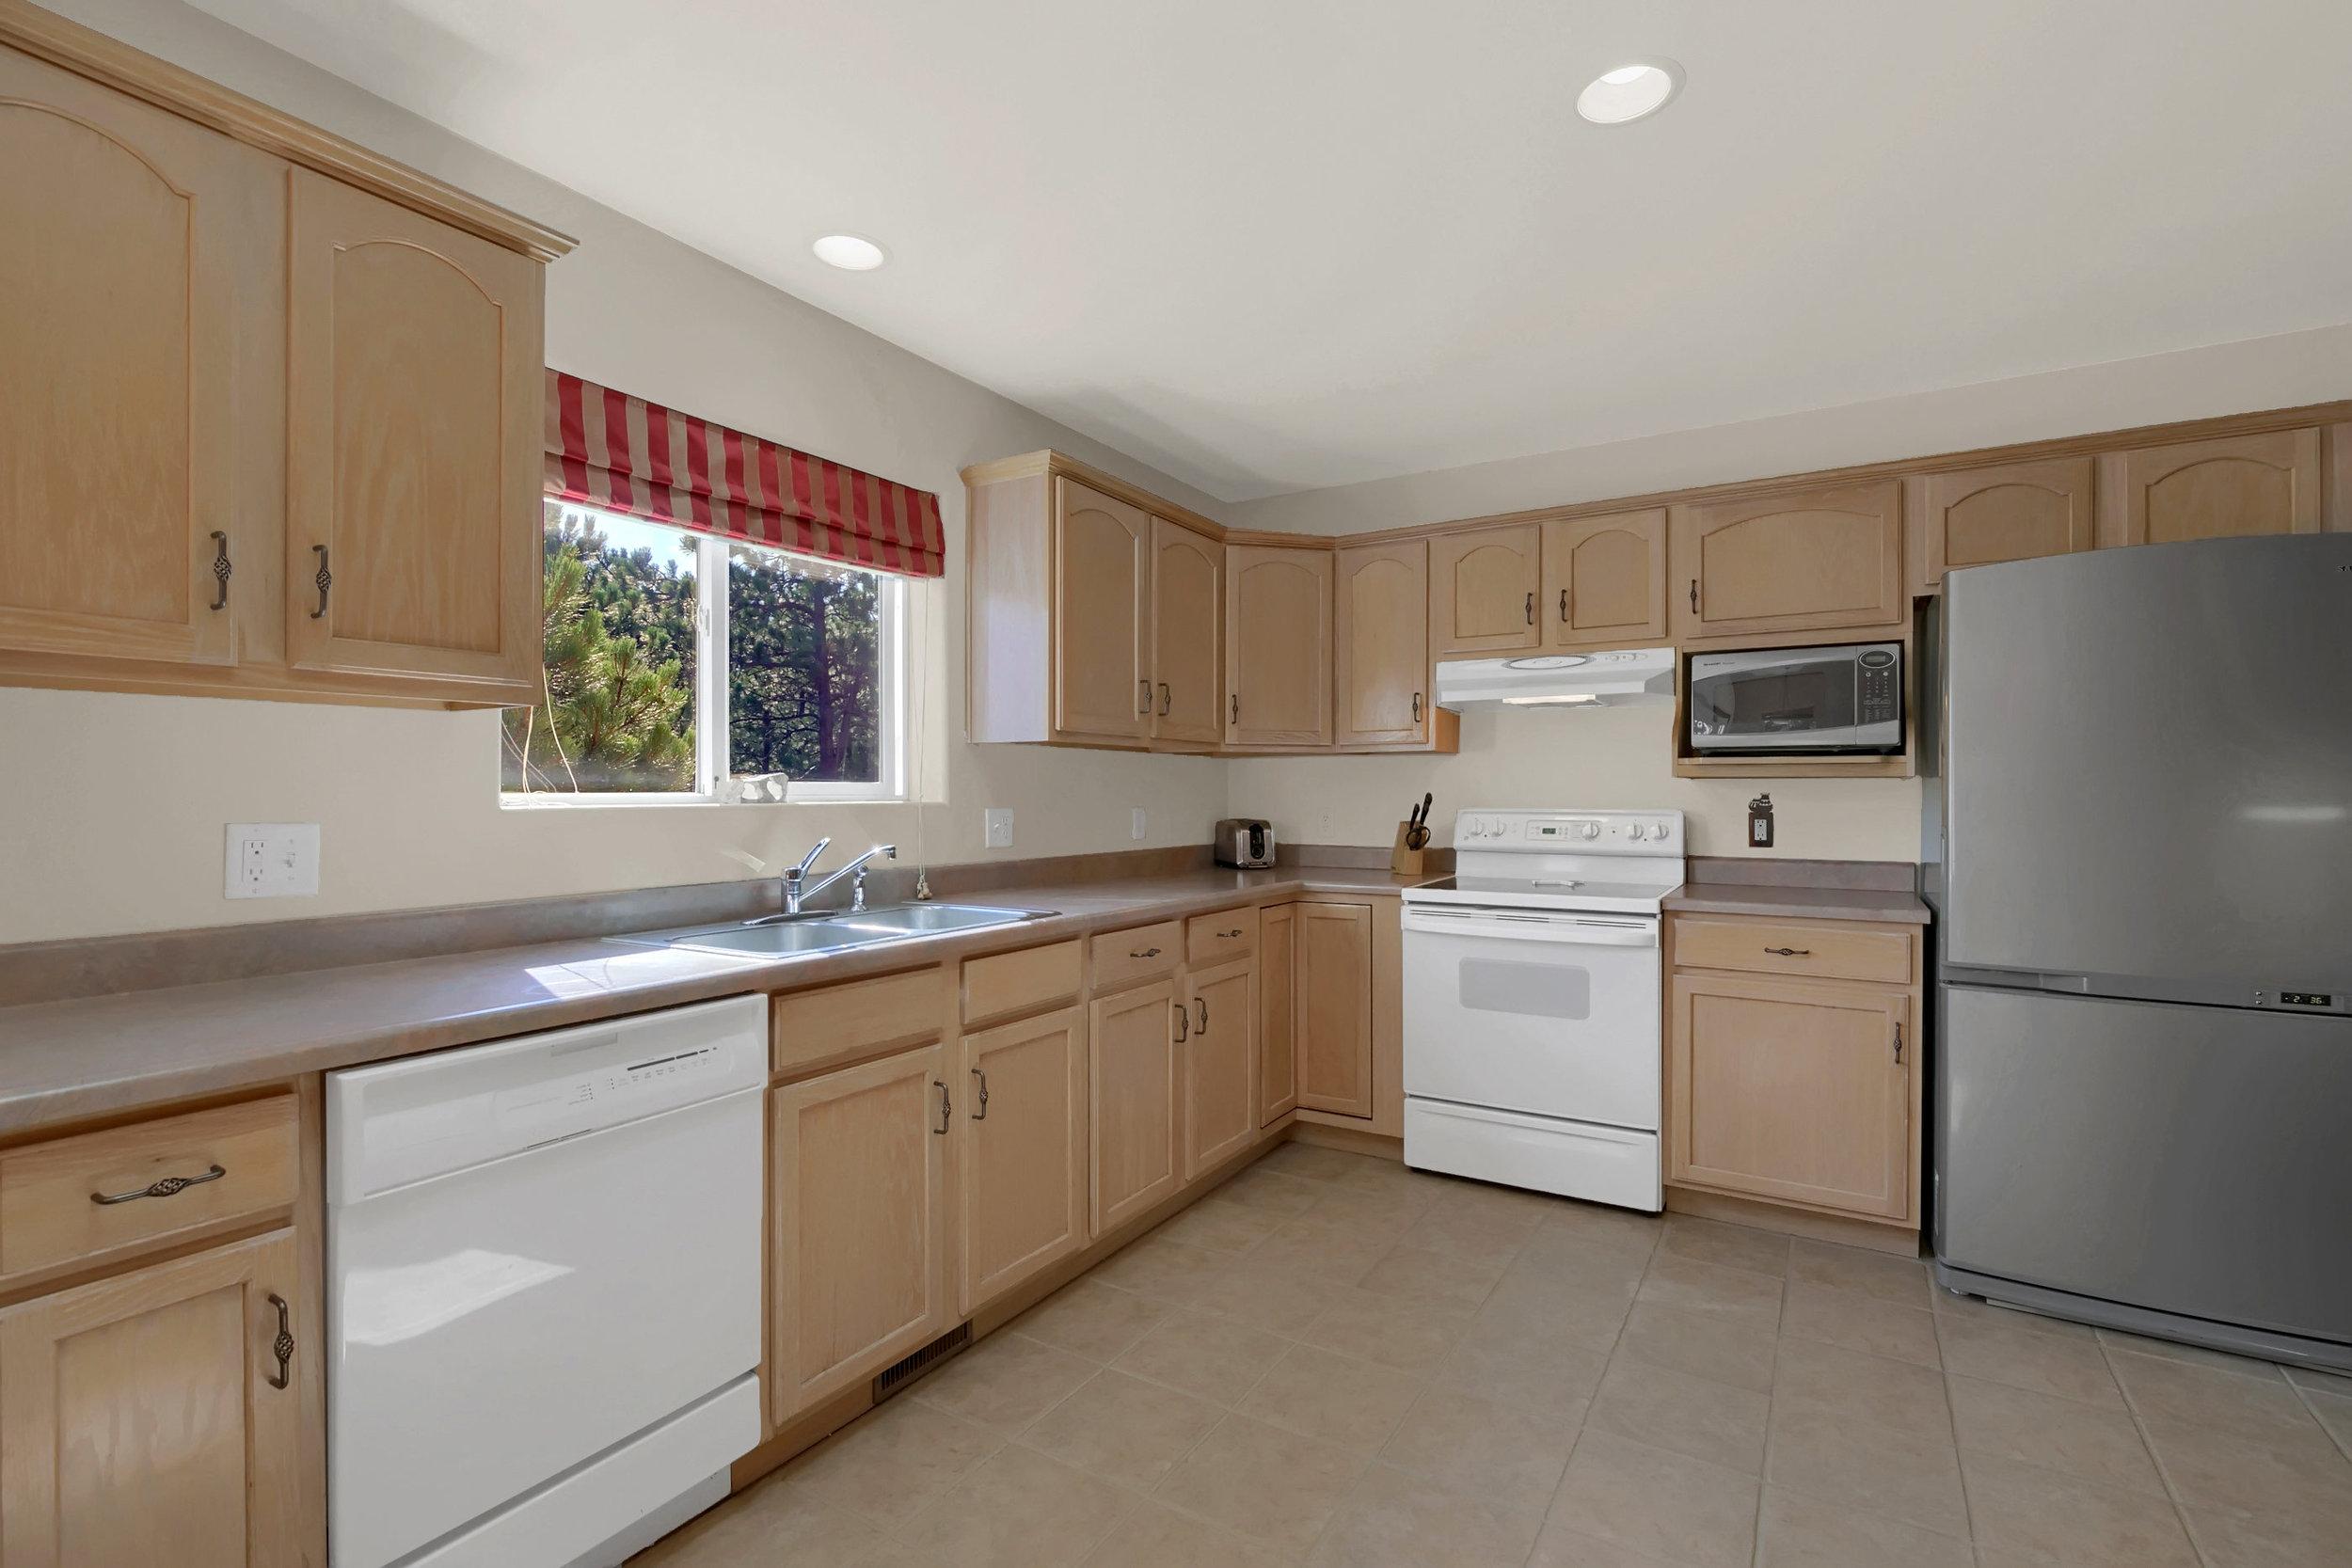 1605 Vickers Drive Colorado-print-017-015-Kitchen-2800x1867-300dpi.jpg